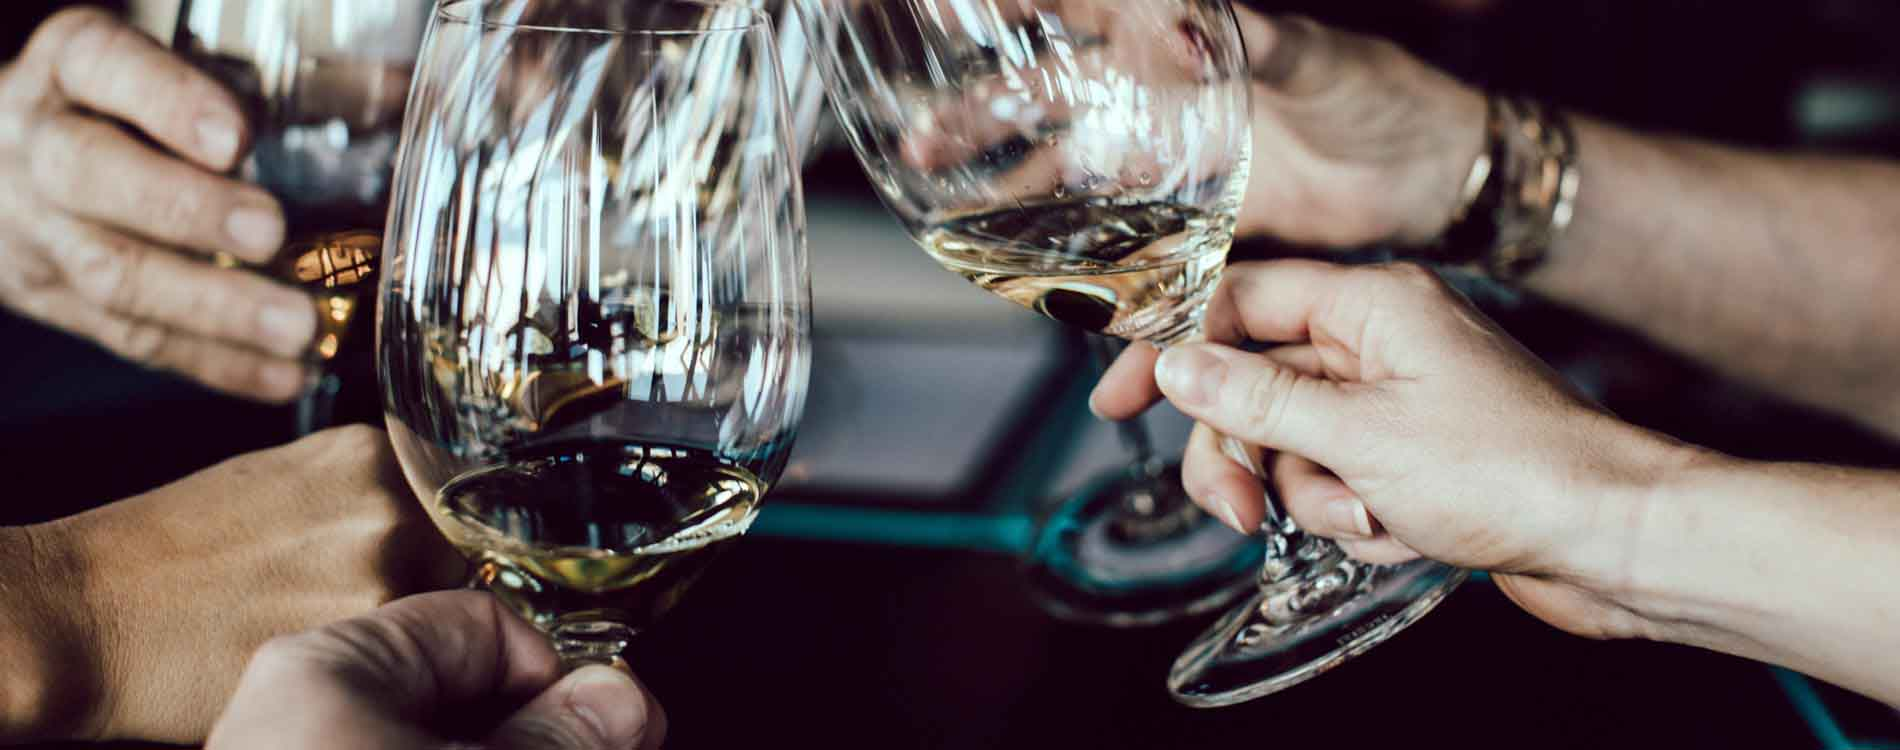 Exclusive wine days at the 5-star Relais & Châteaux Rosengarten Kirchberg Kitzbuehel